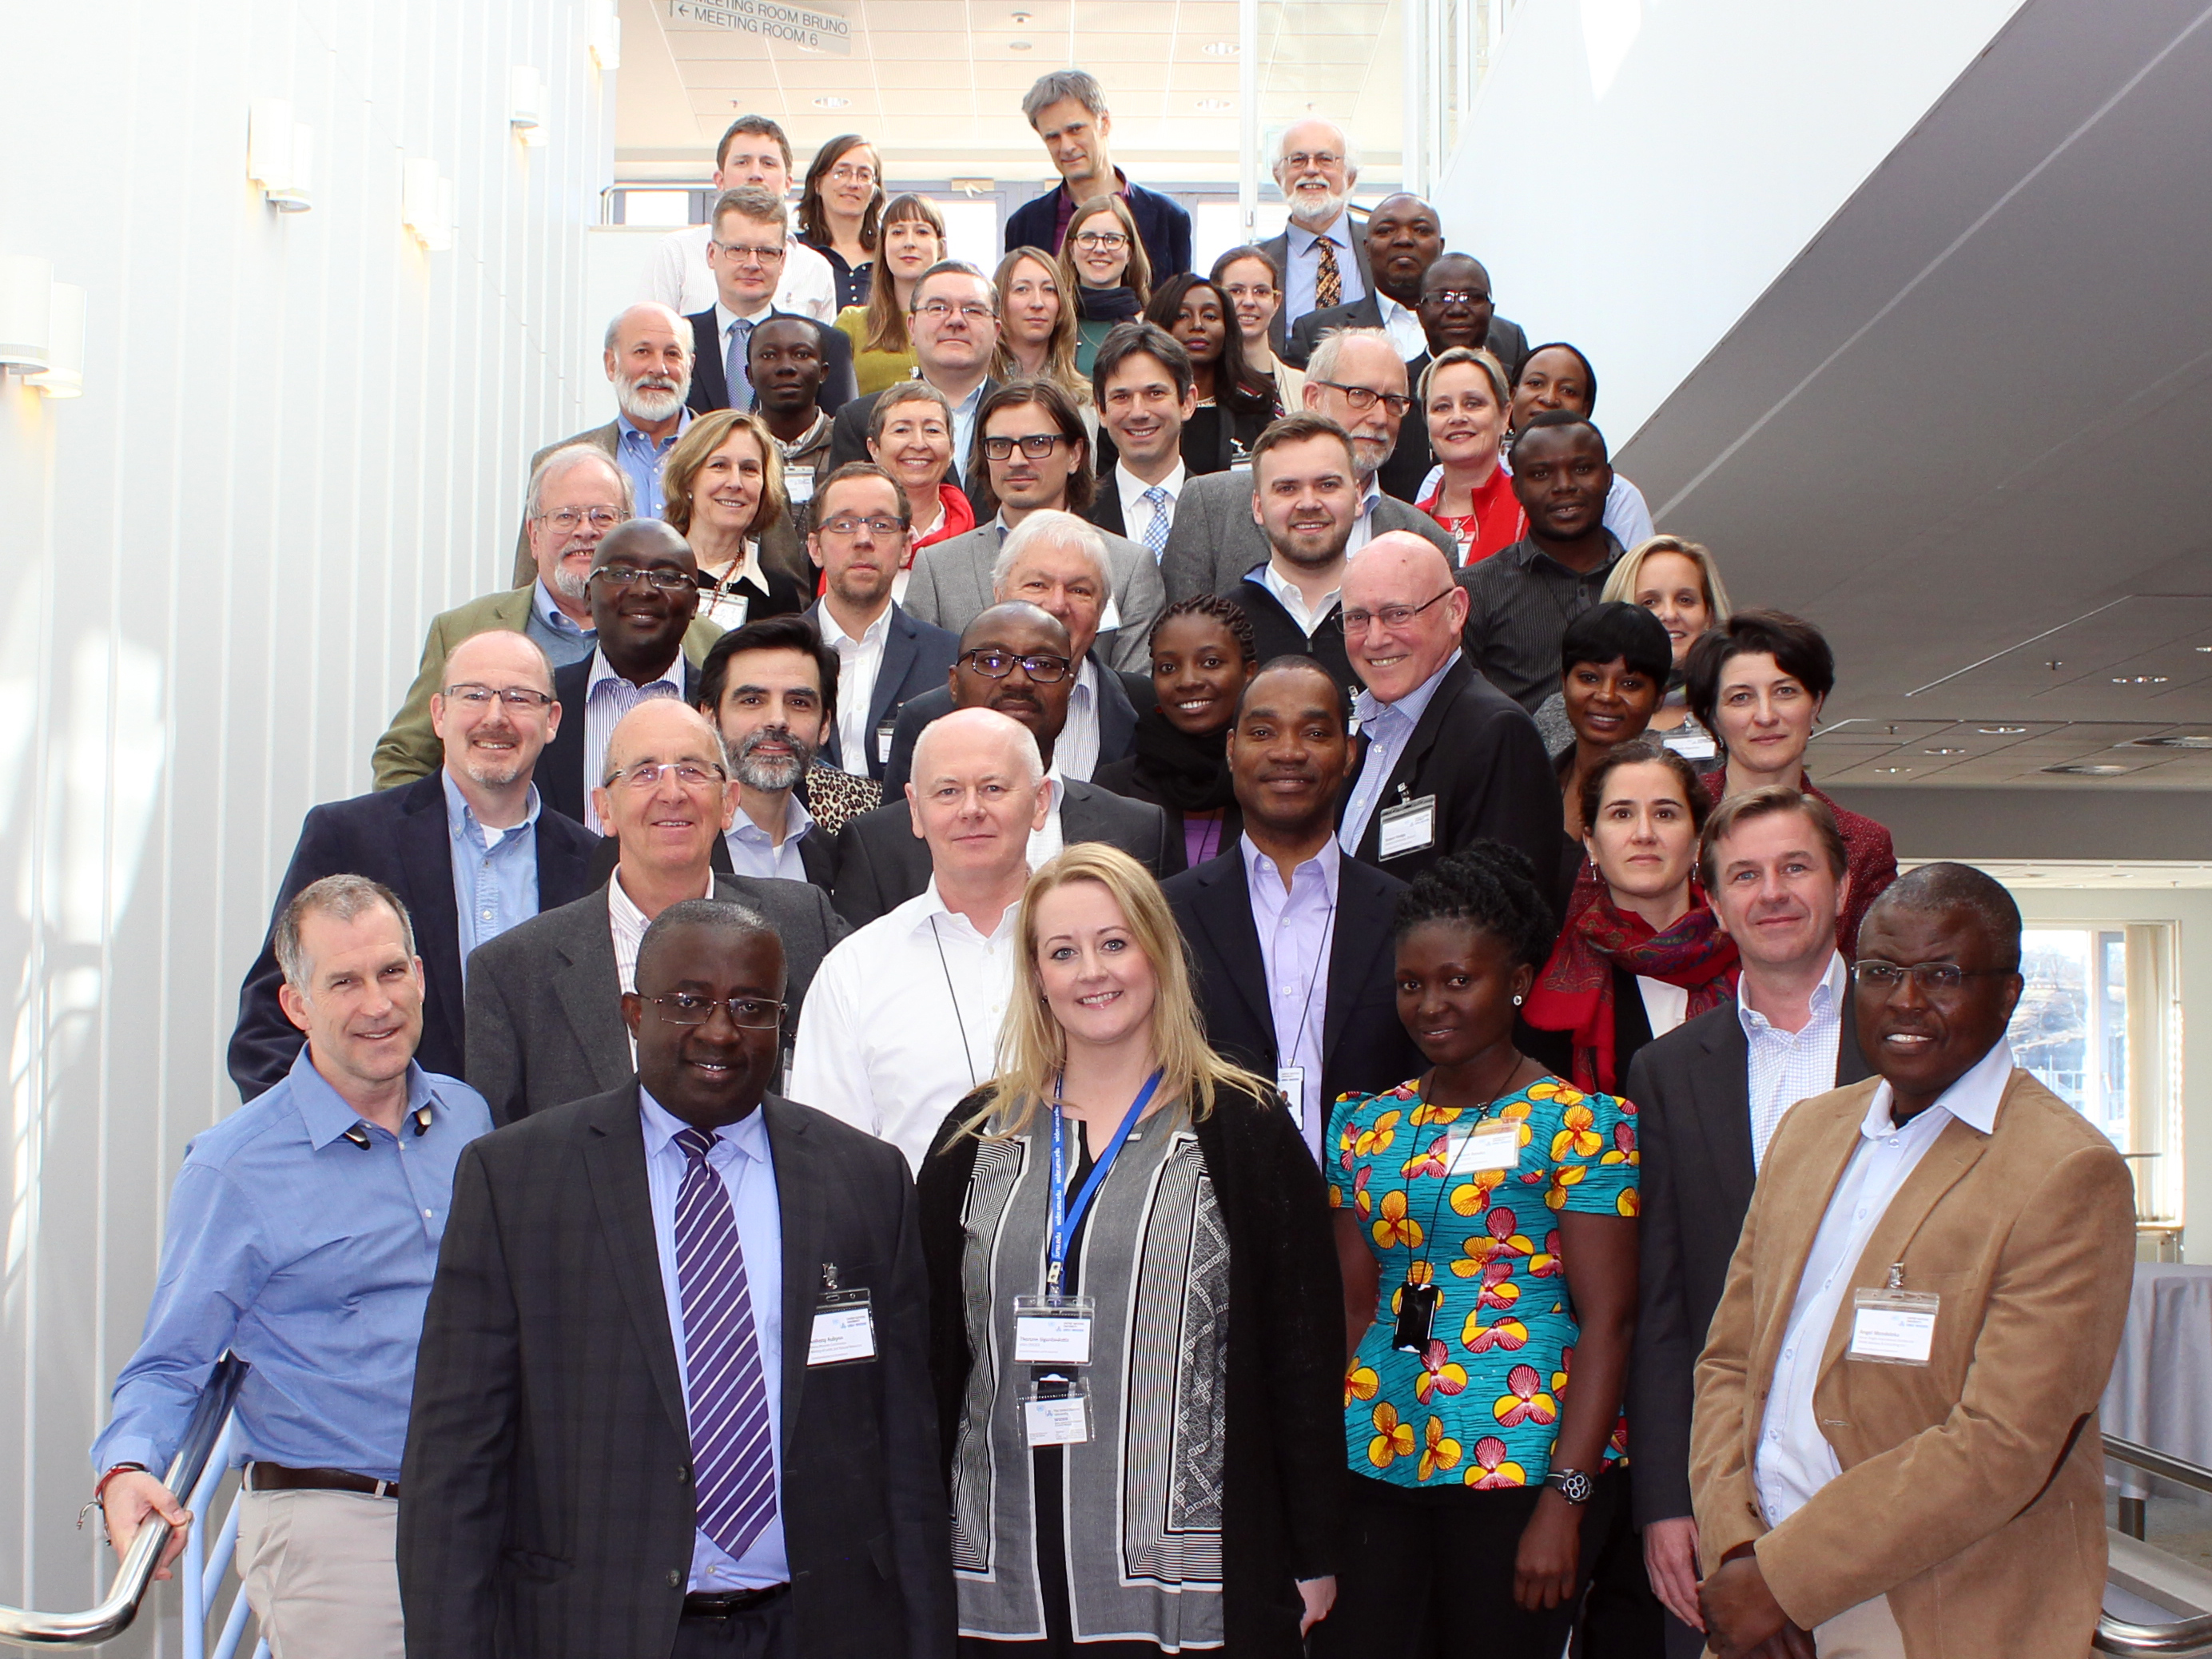 UNU-WIDER Development Conference 2017